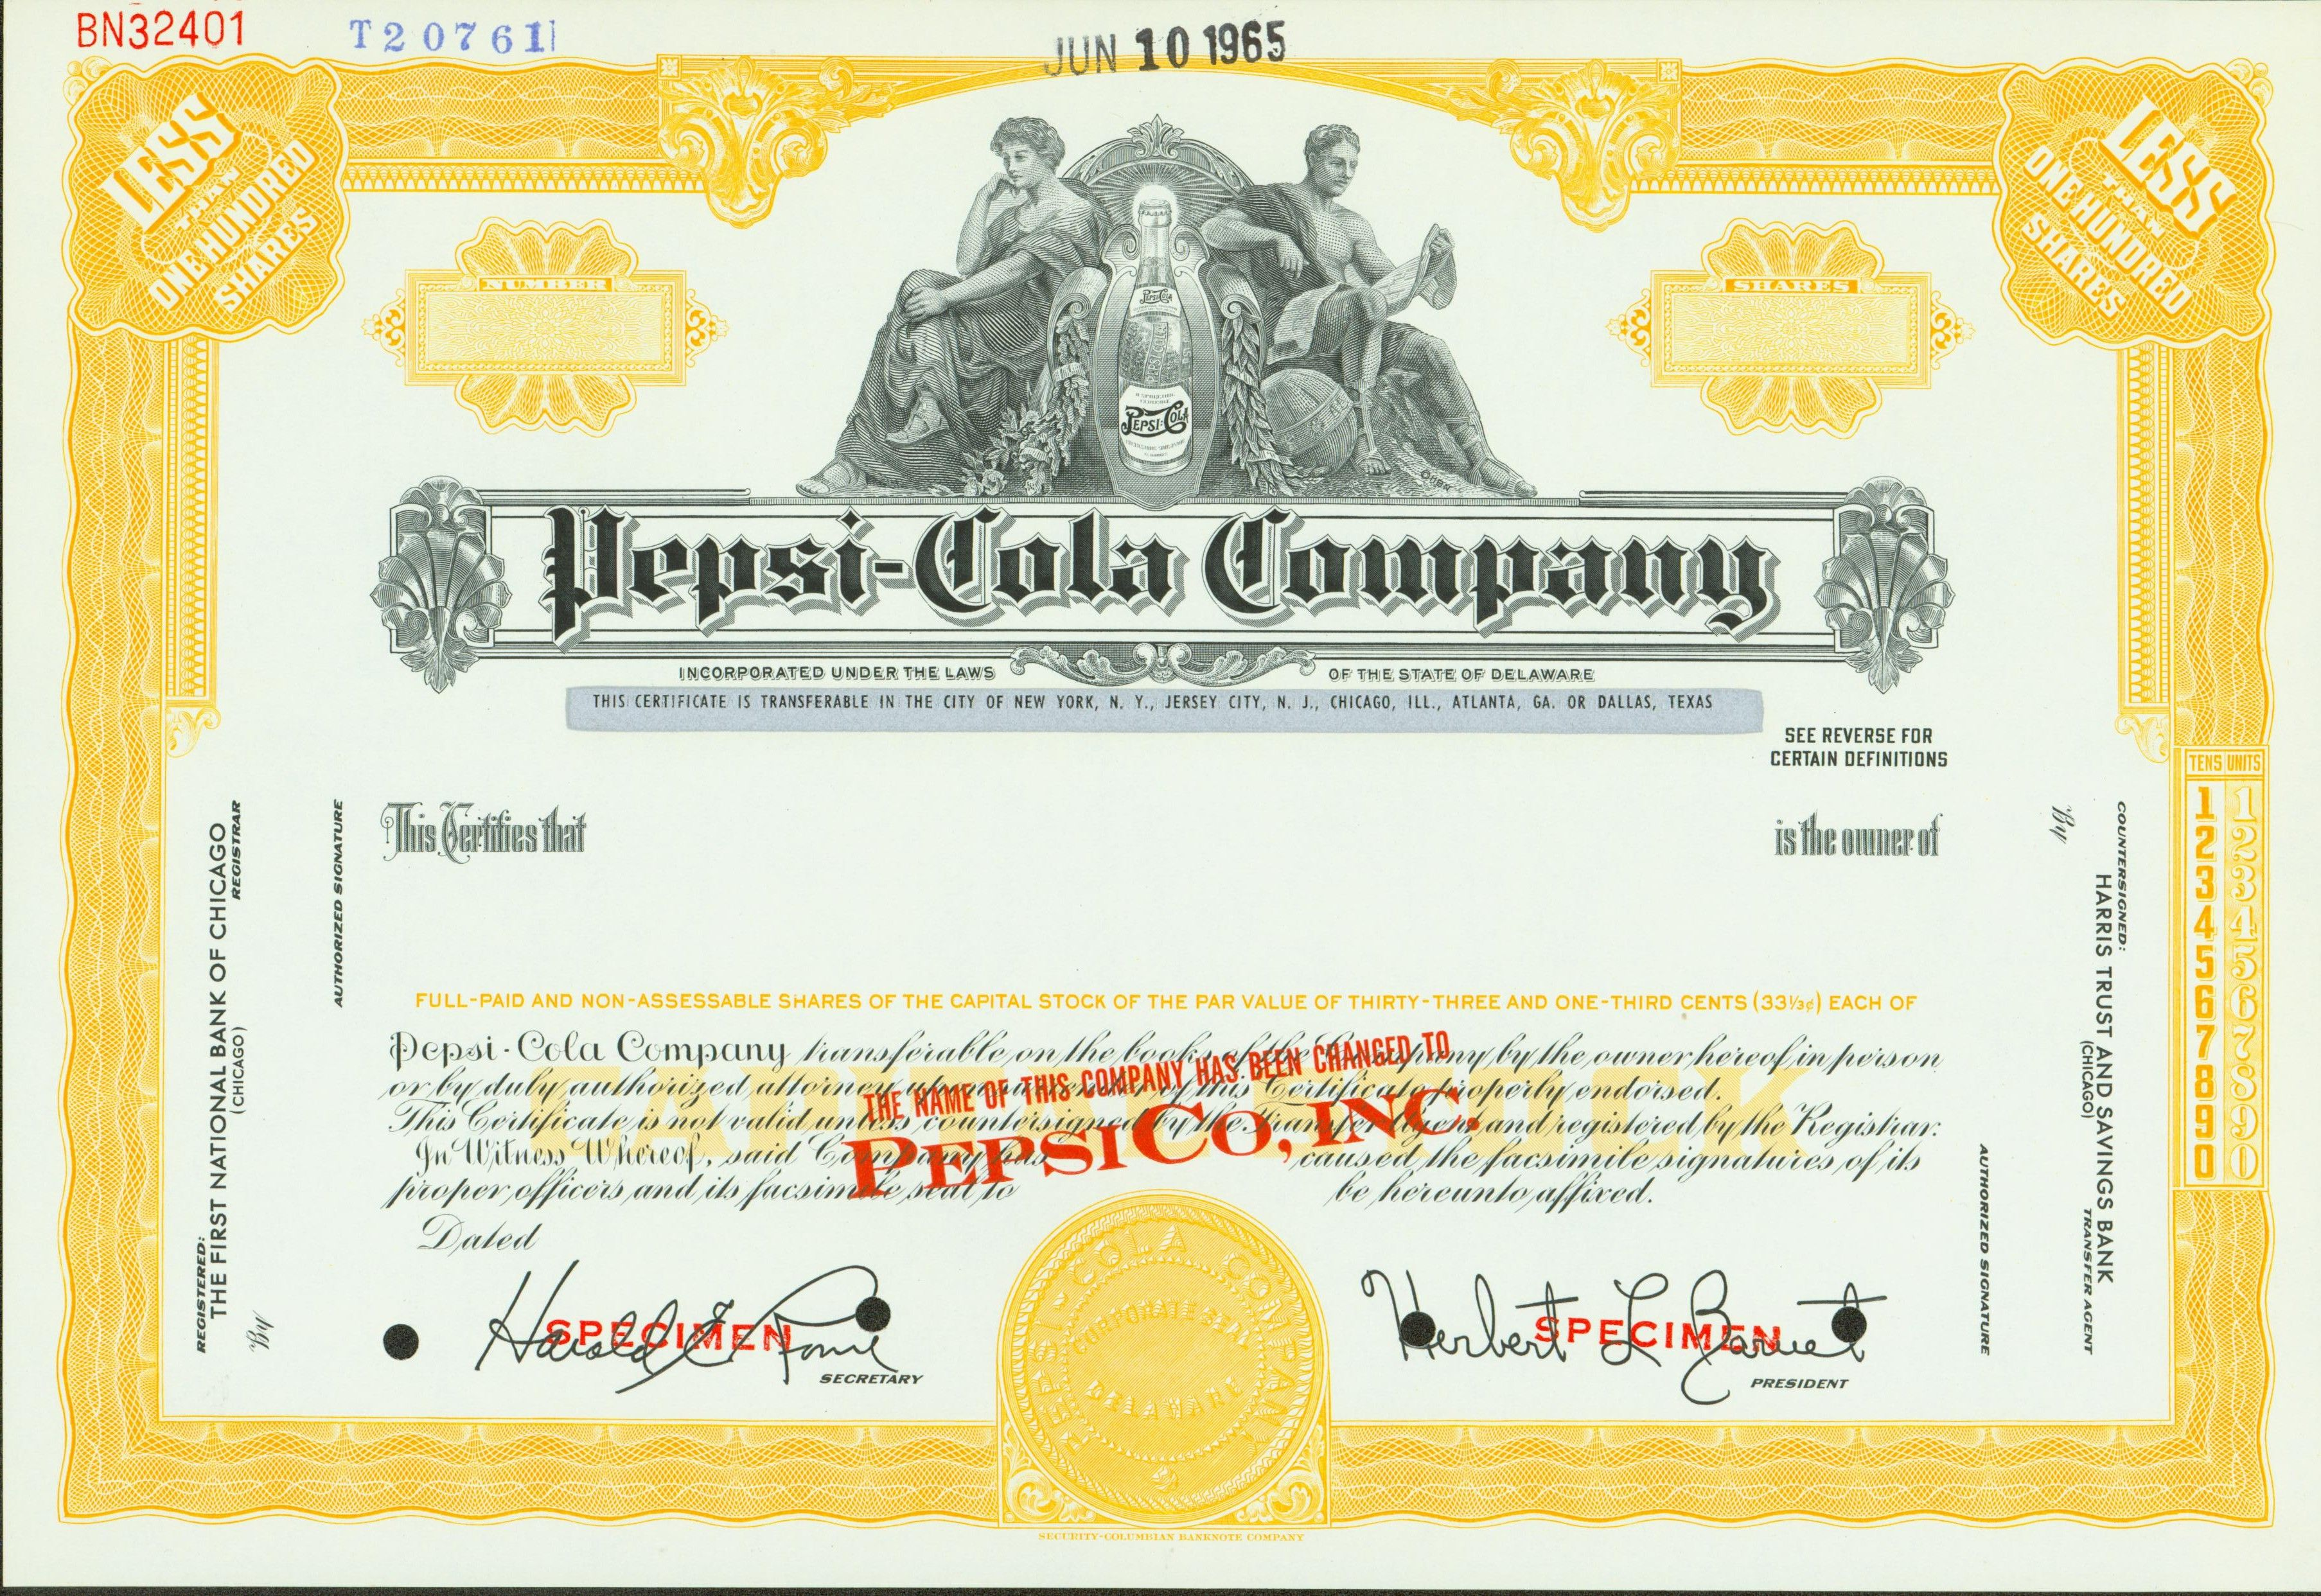 Pepsi Cola Company Stock Certificate, 1965  Company Share Certificates